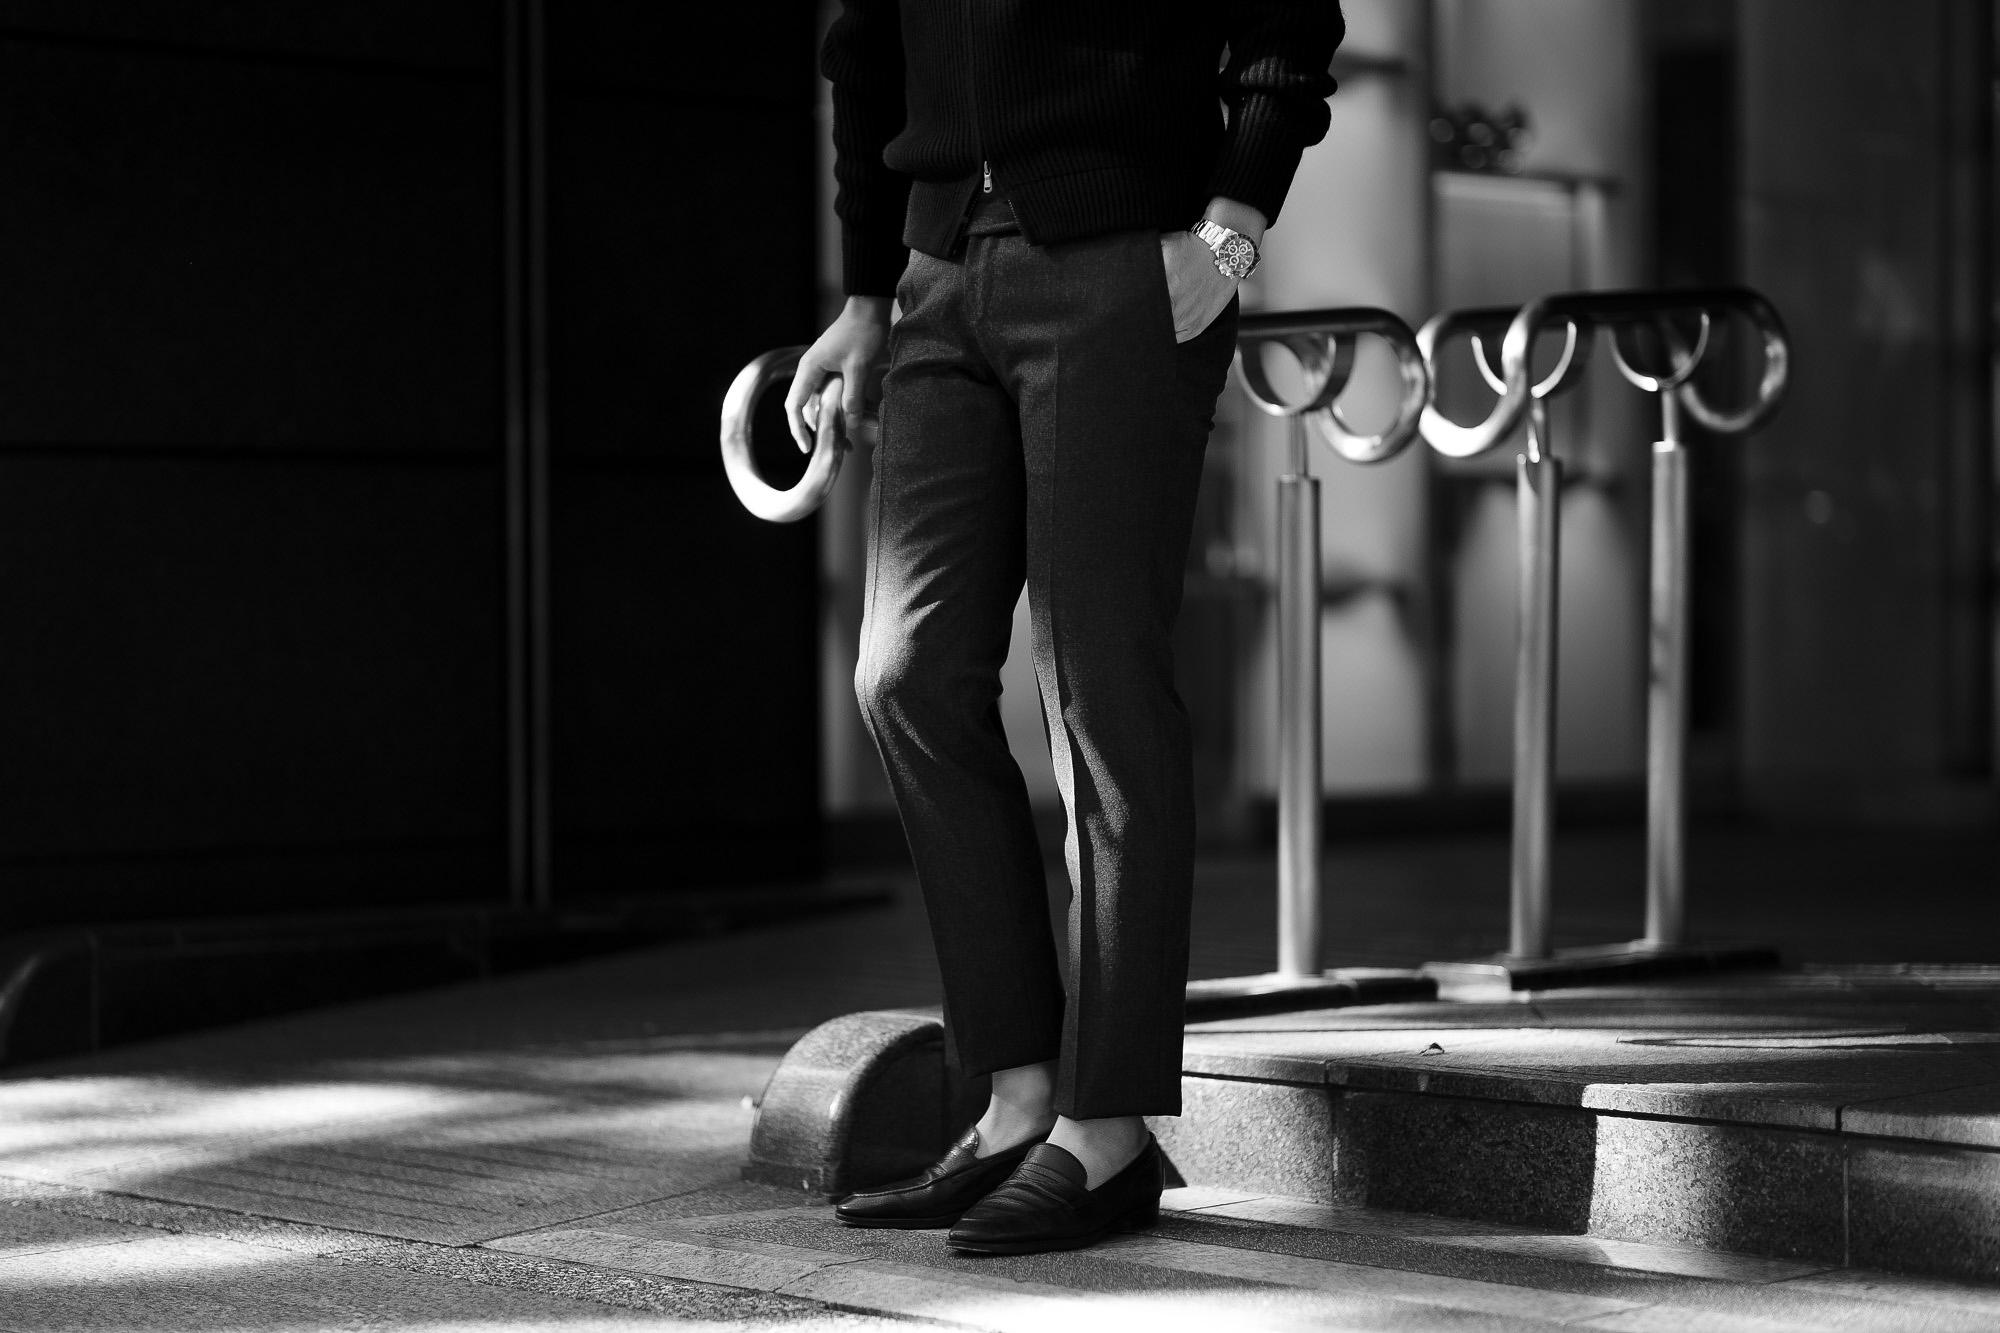 INCOTEX (インコテックス) N35 SLIM FIT (1T0N35) SUPER 100'S WOOLLEN TWILL サージウール スラックス BLACK (ブラック・990) 2020 秋冬 【ご予約受付中】愛知 名古屋 altoediritto アルトエデリット